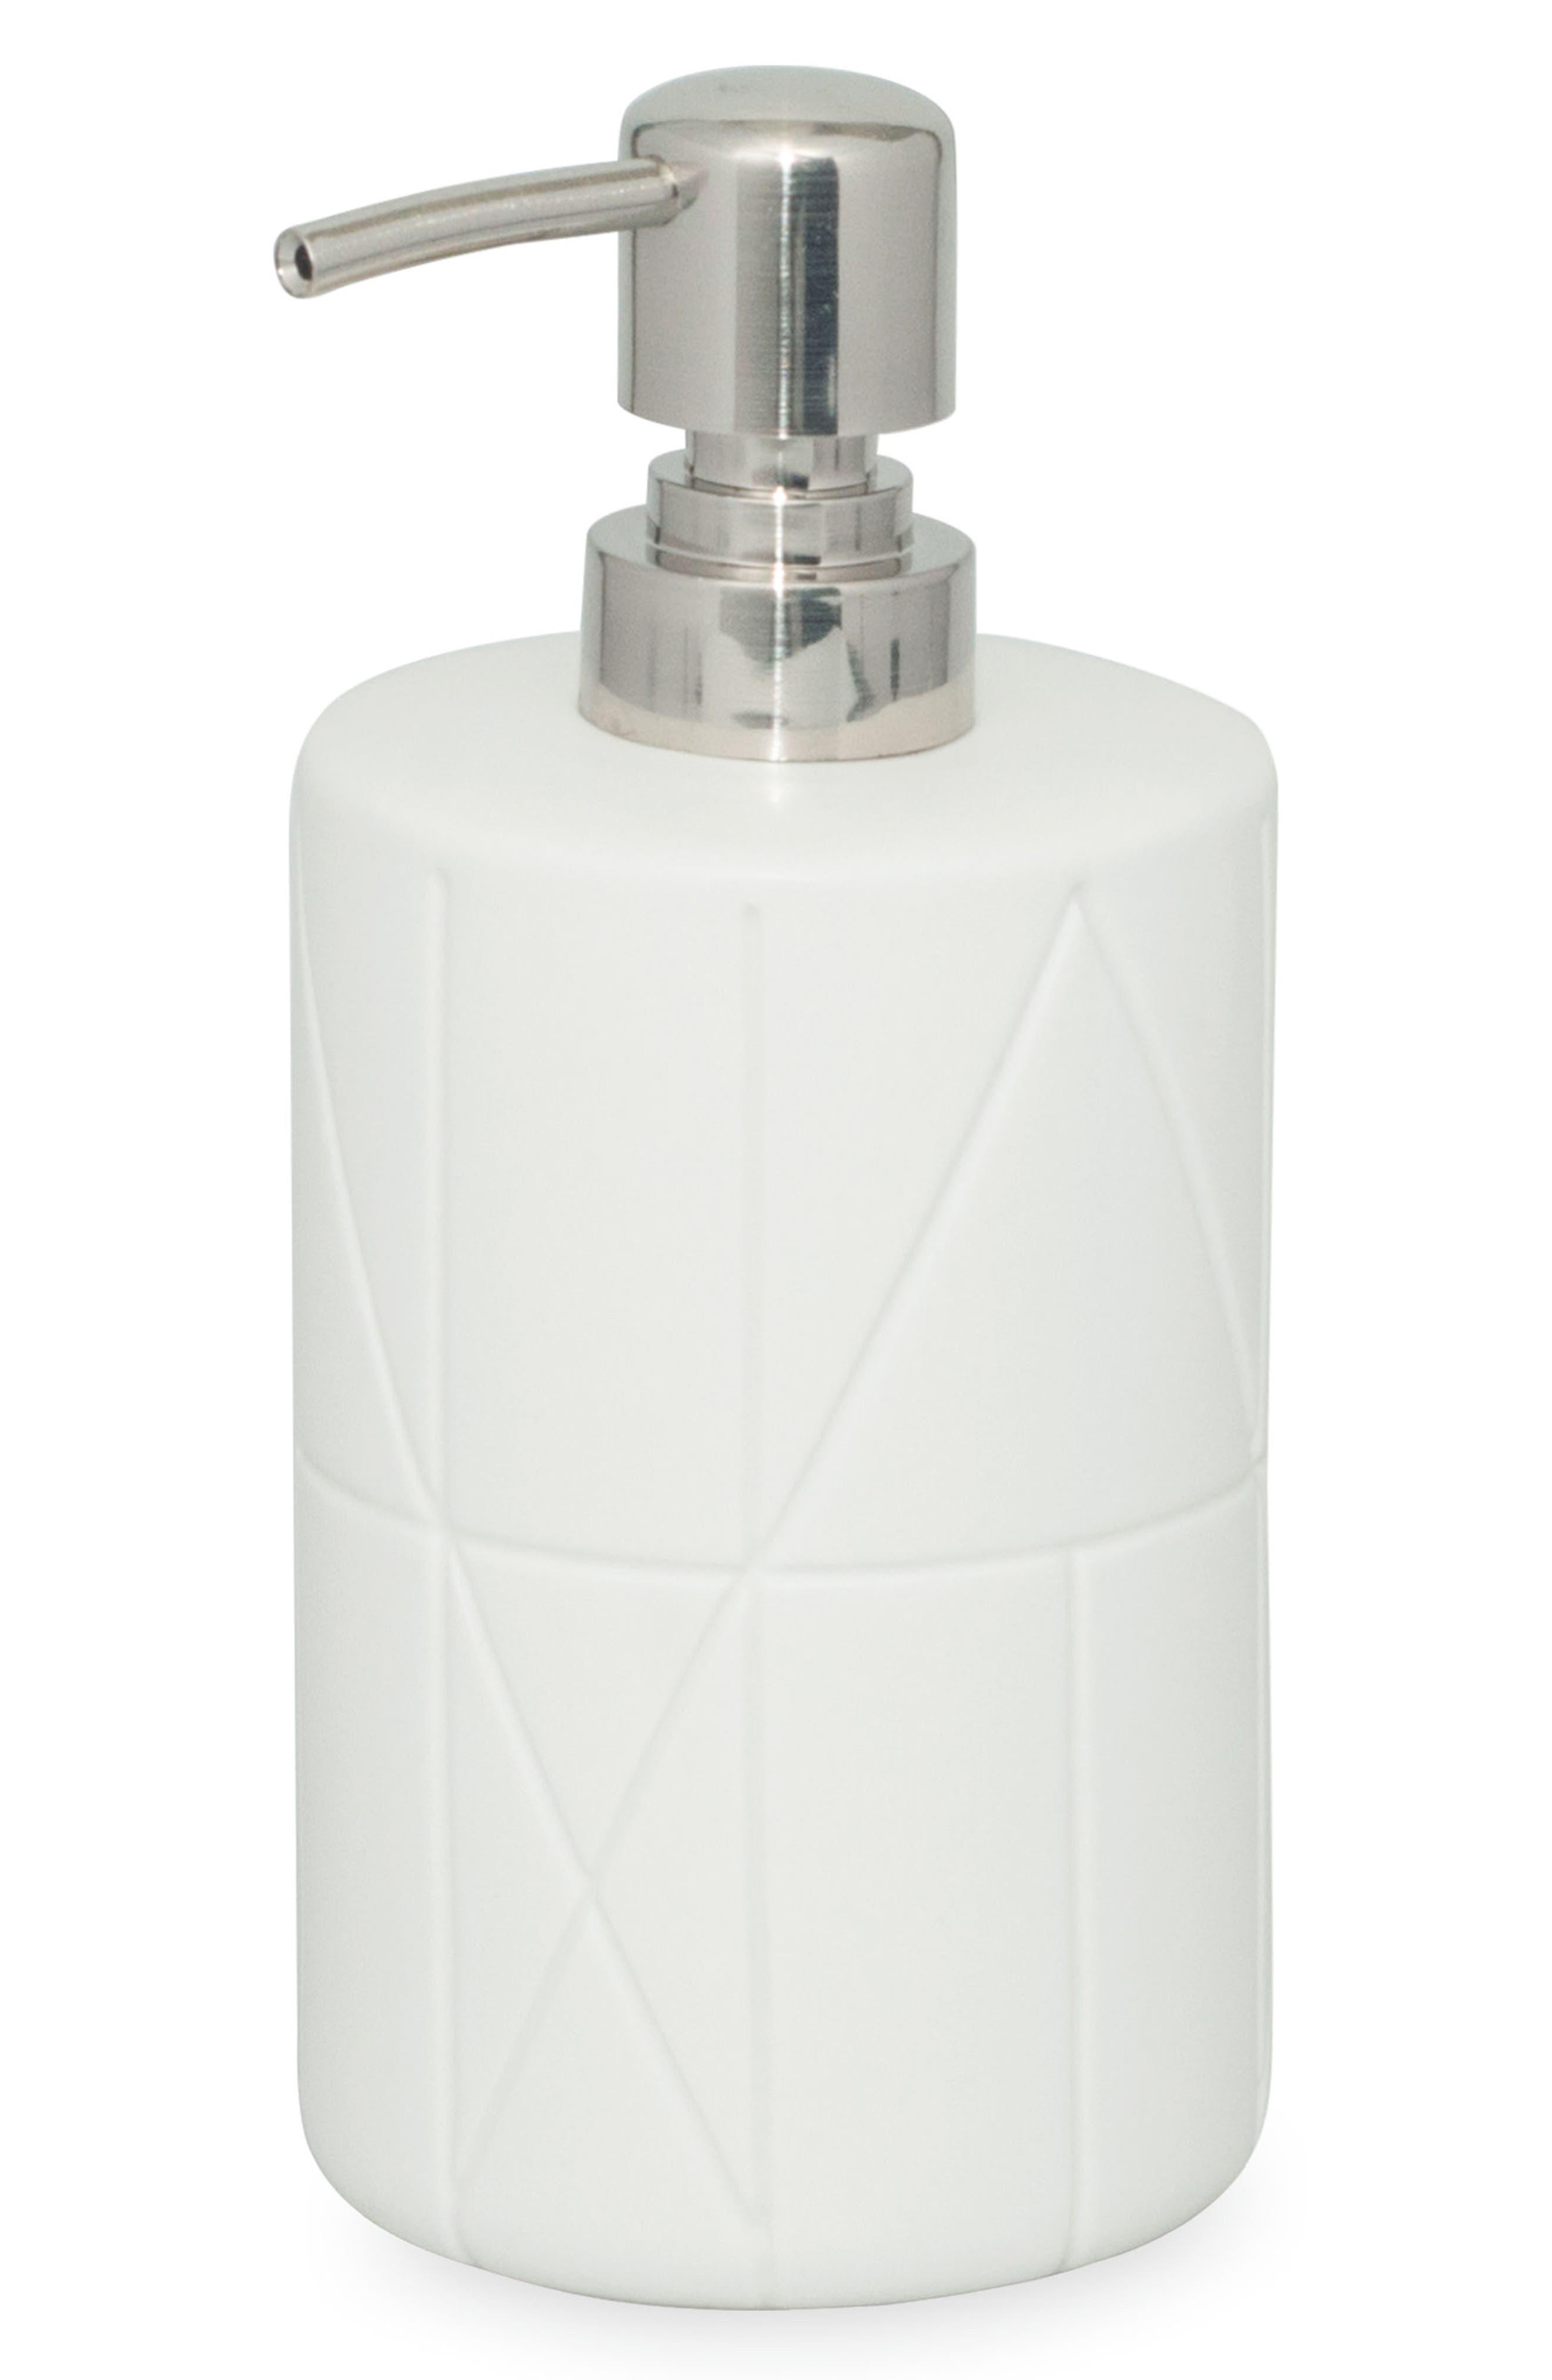 DKNY Geometrix Lotion Pump